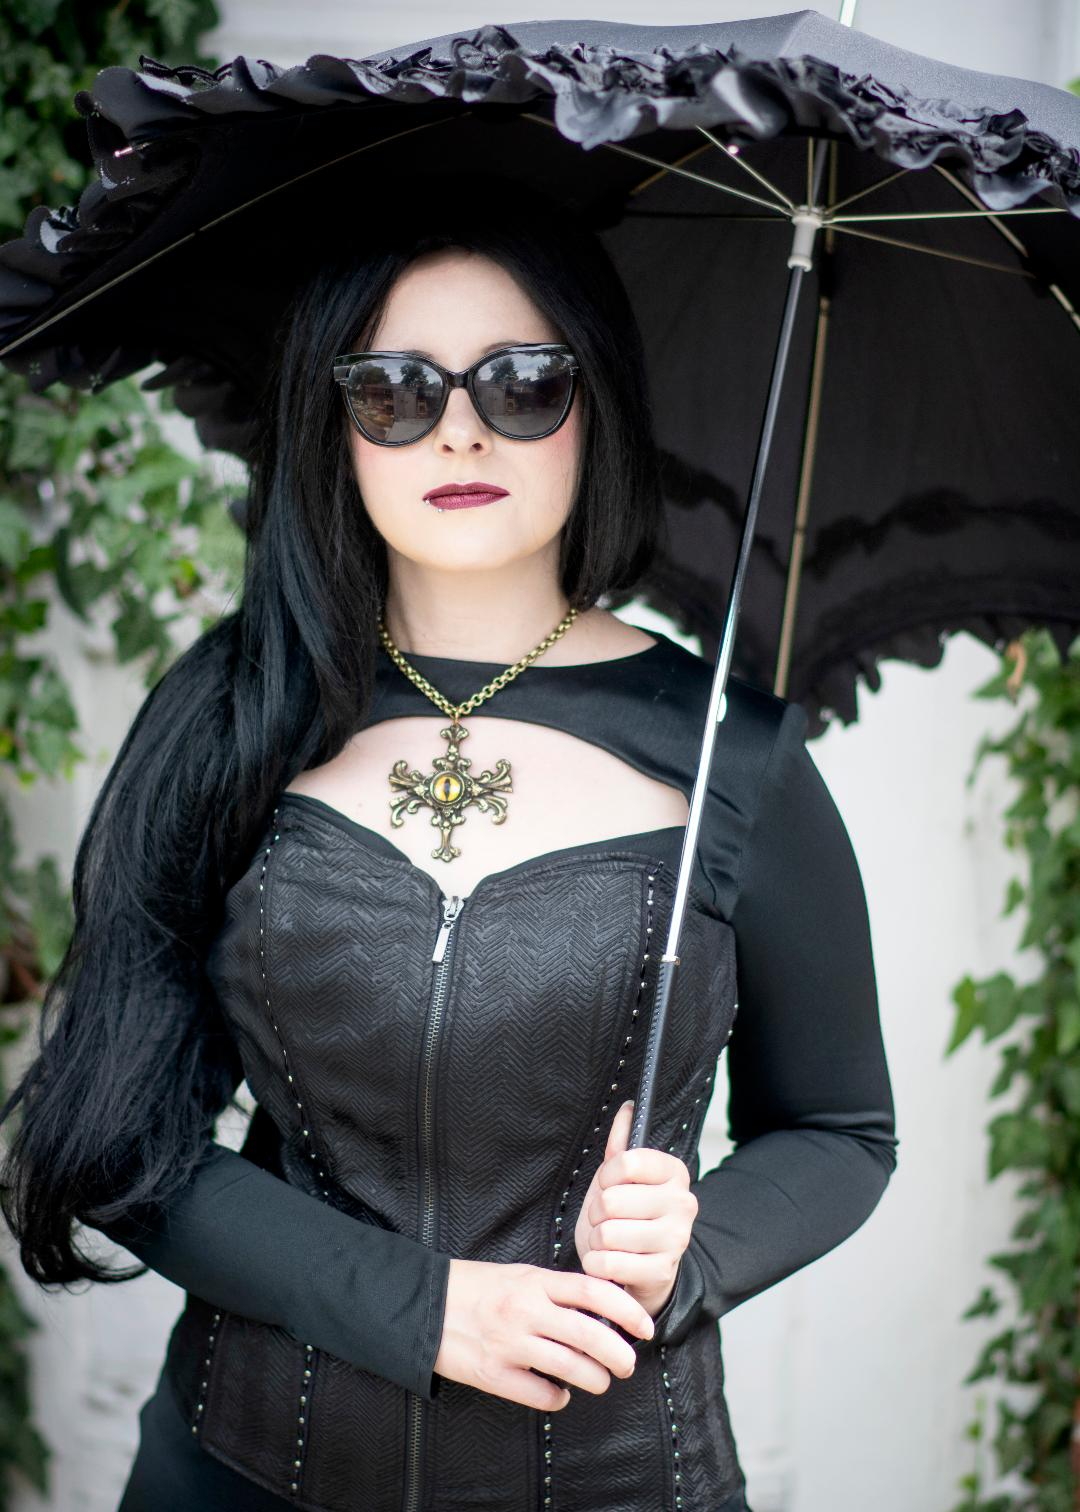 Model: Brenda Nix Photographer: Margo Elfstrom Jewelry: Eye of Tiamat with gold dragon eye